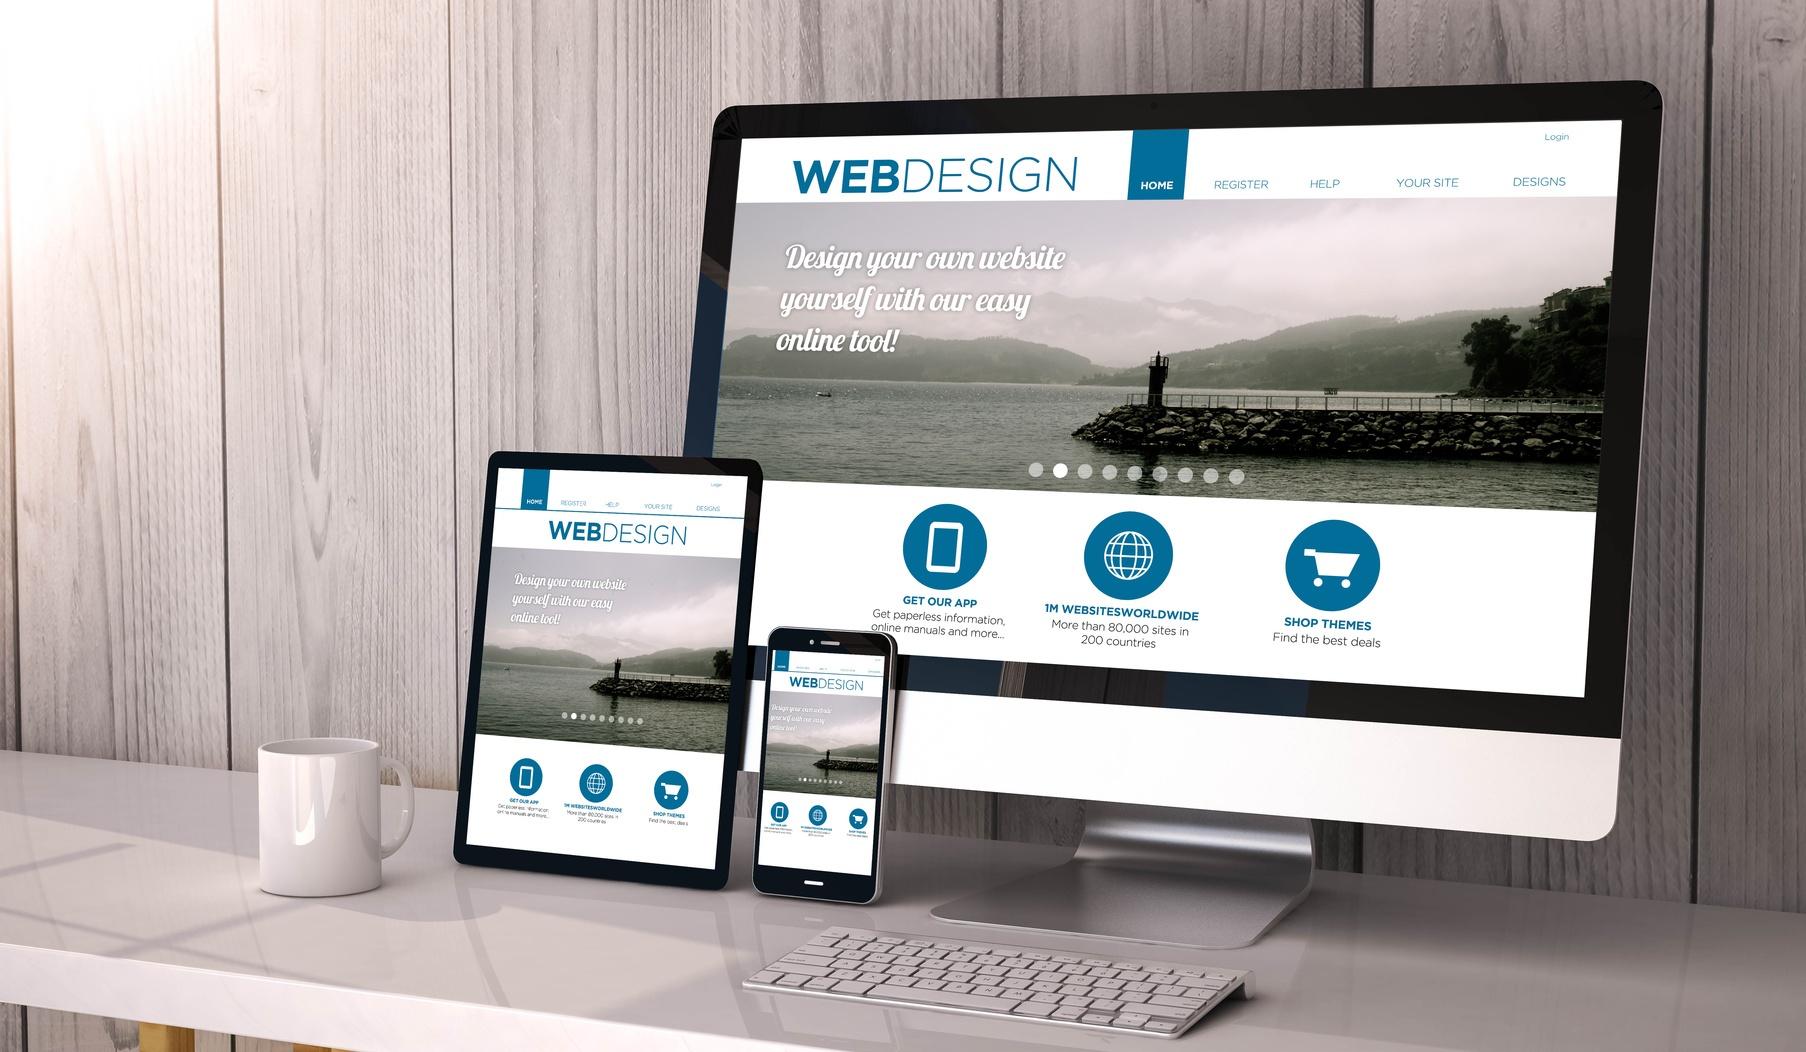 WebDesignPicture.jpg